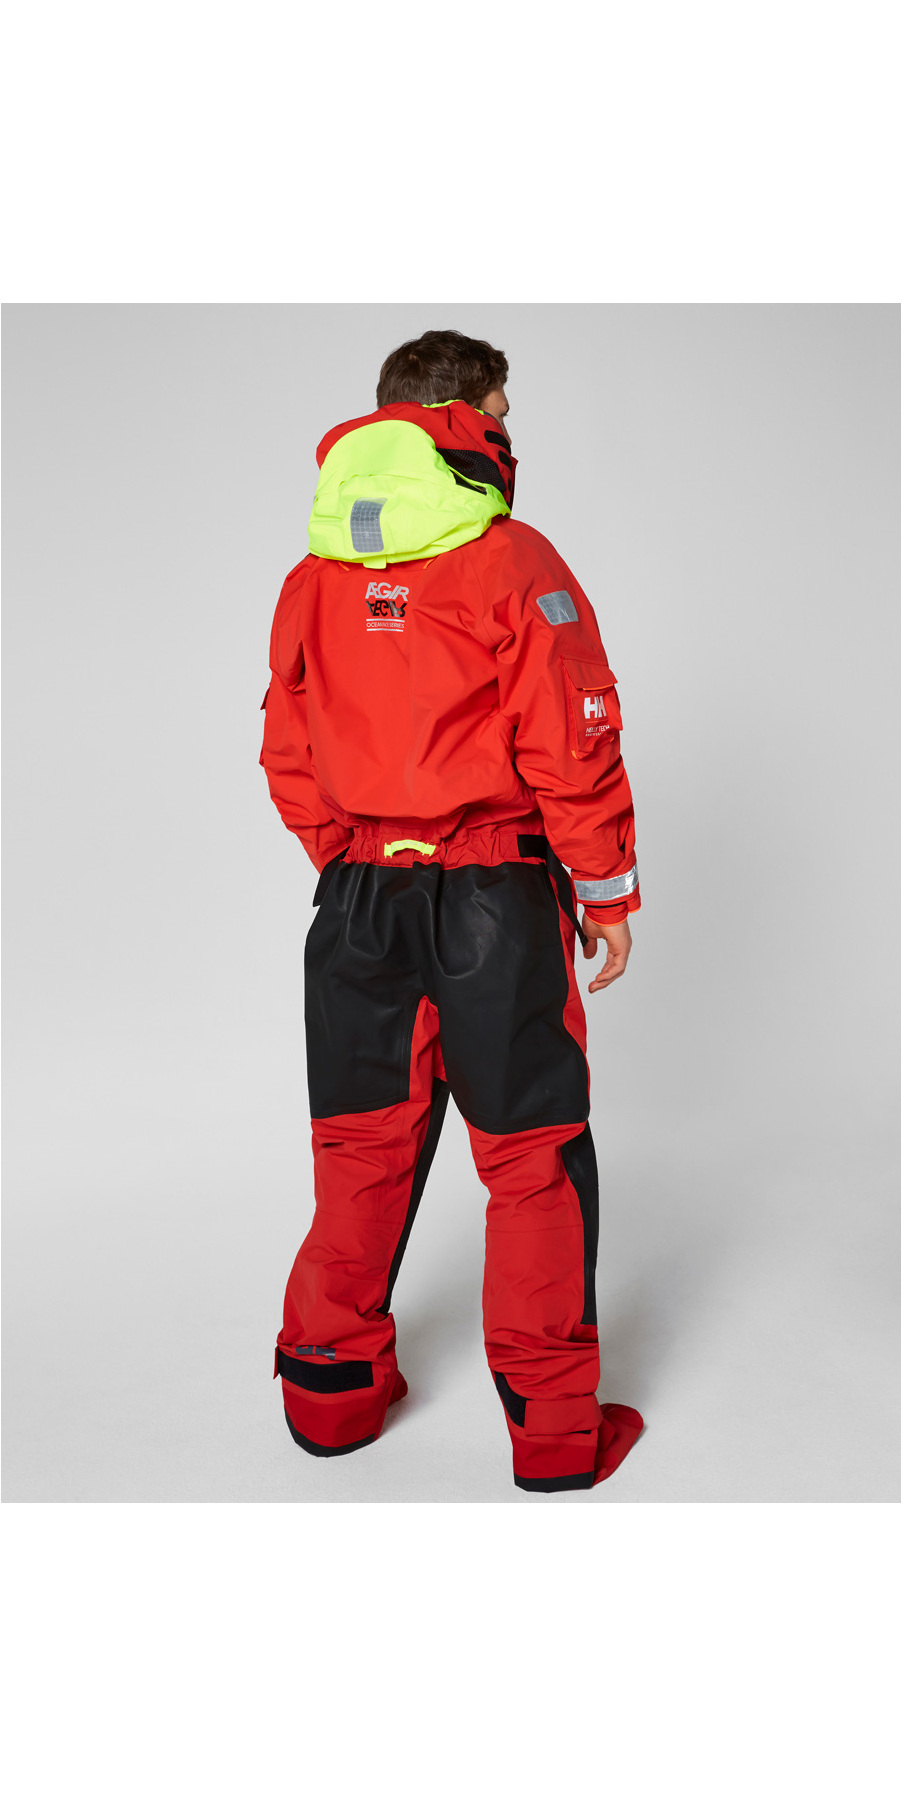 2018 Helly Hansen Aegir Ocean Survival Drysuit Alert Red 31706